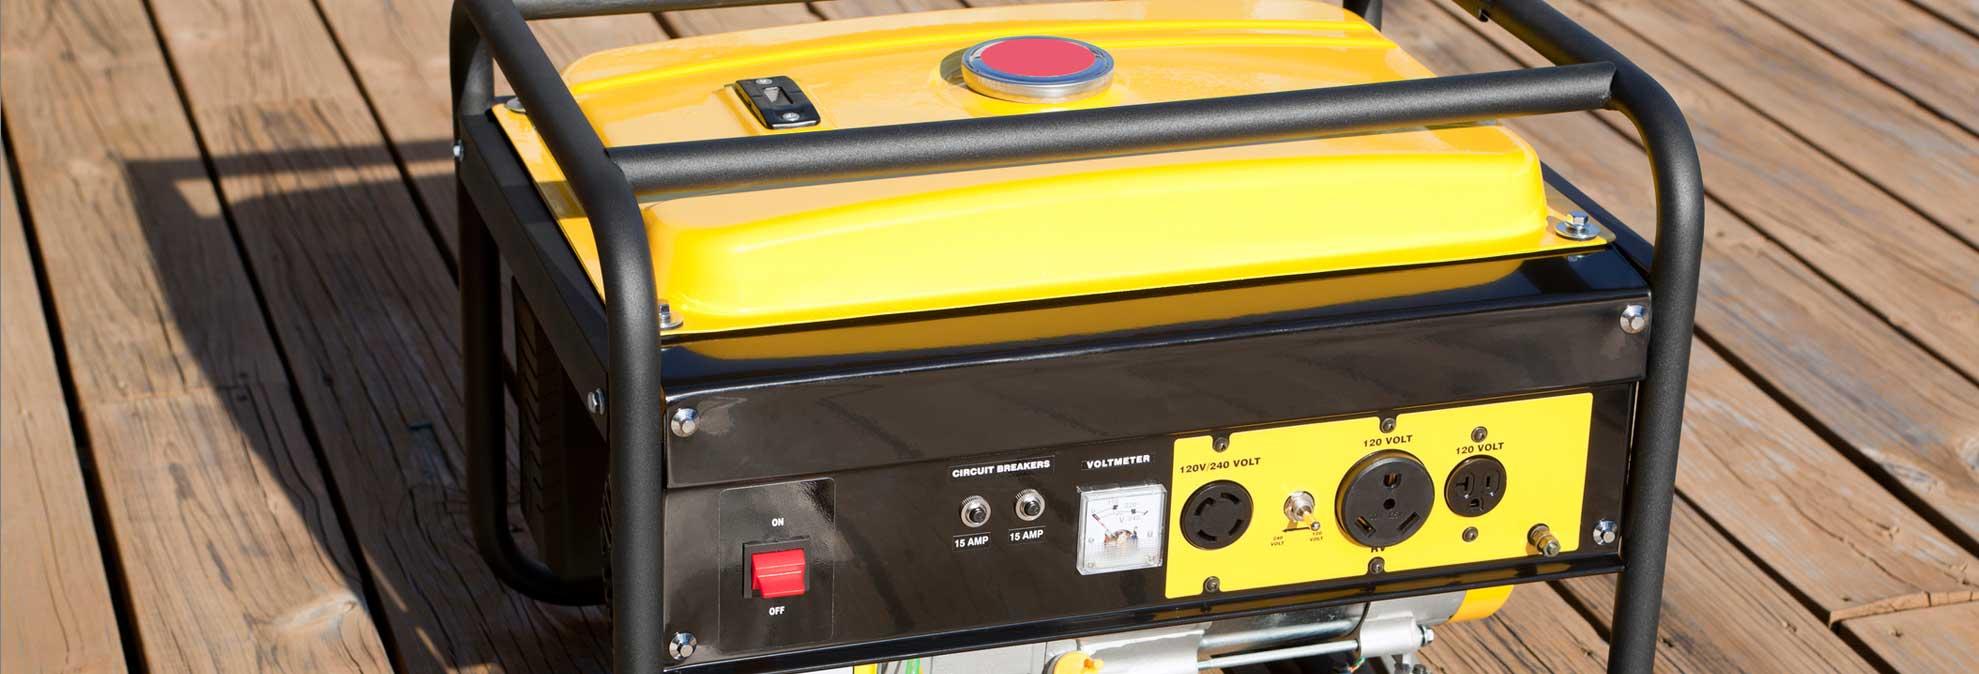 Portable Generators Carbon Monoxide Emisisions Consumer